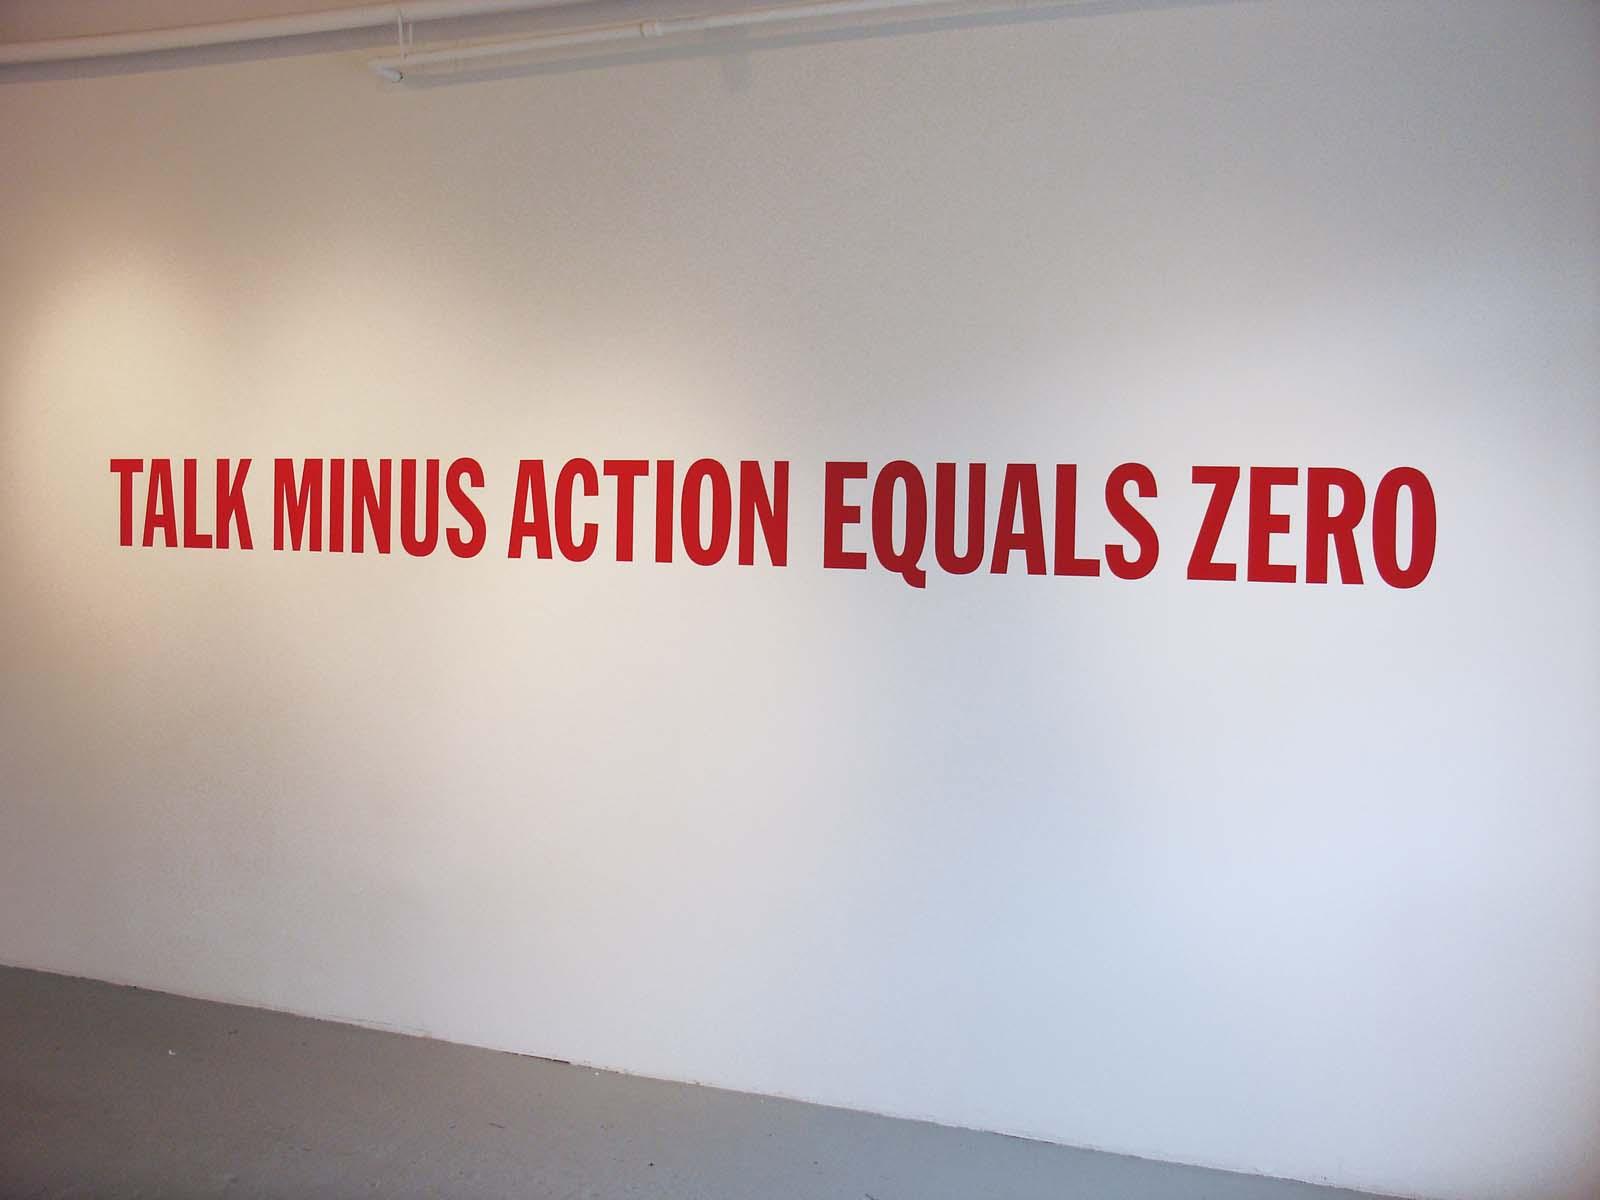 Talk Minus Action, 2010, 14.25 x 160 inches, vinyl